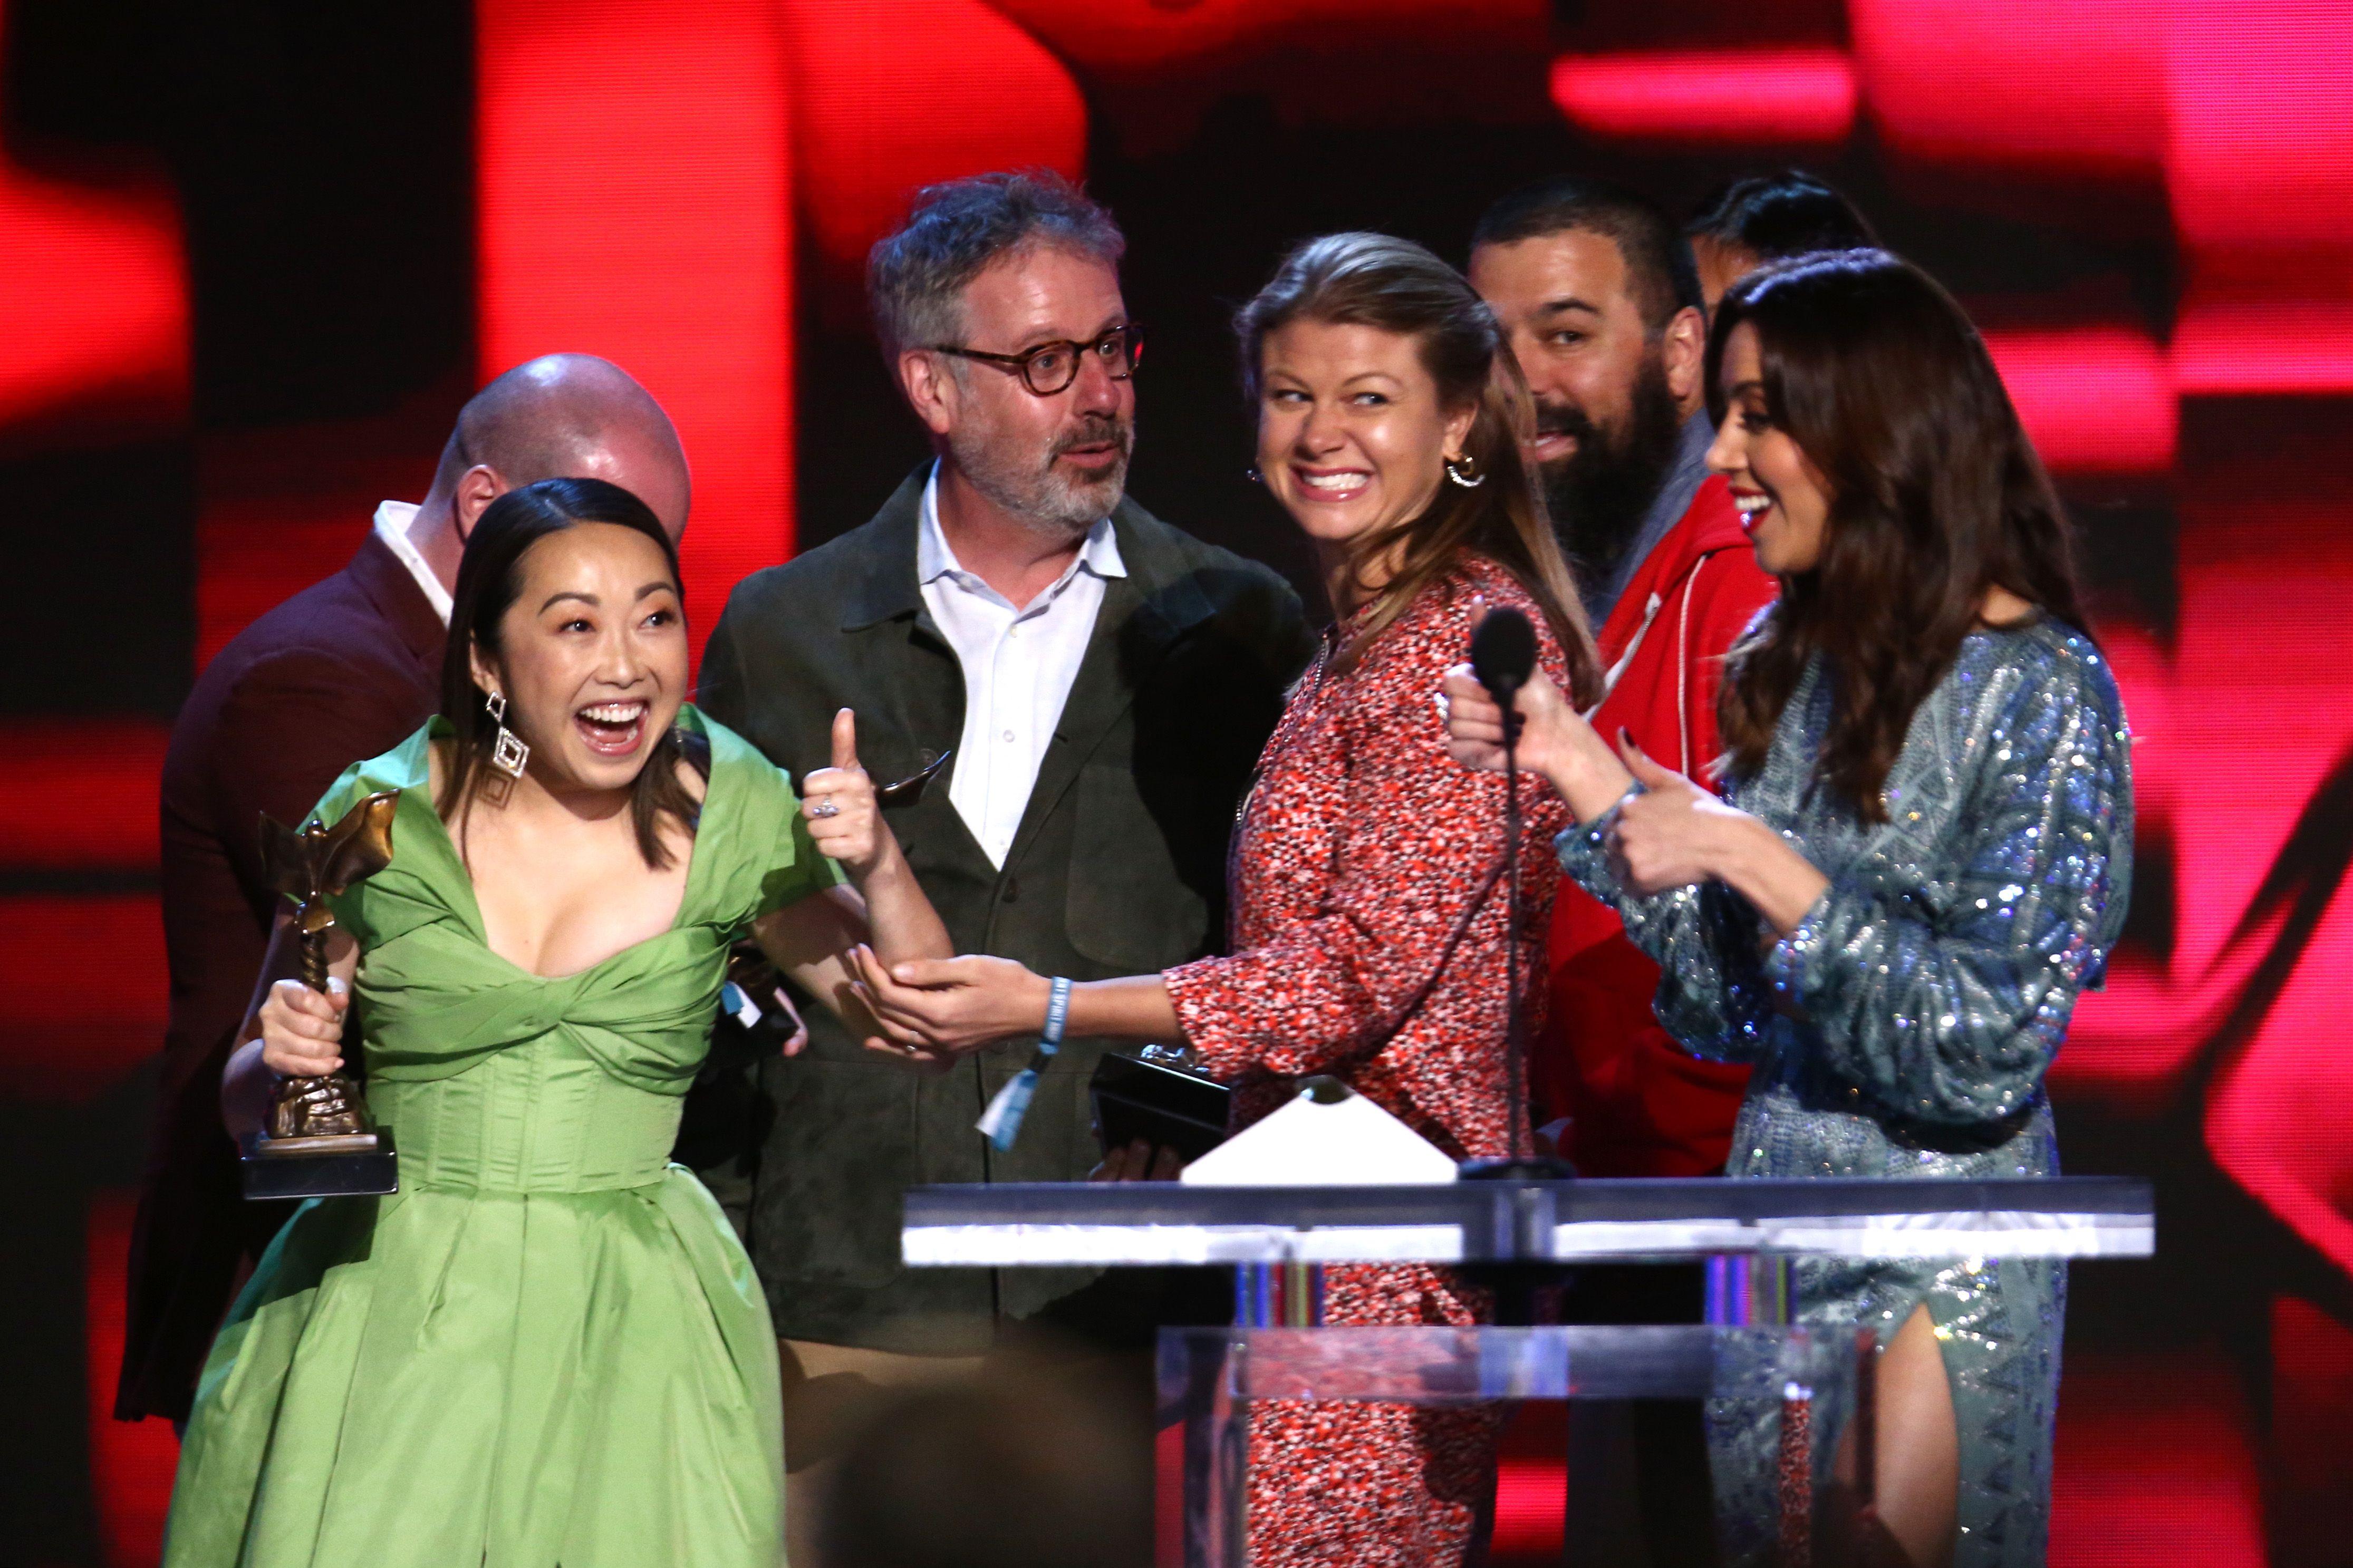 The Farewell's Lulu Wang wins top film prize at Spirit awards after Oscars snub